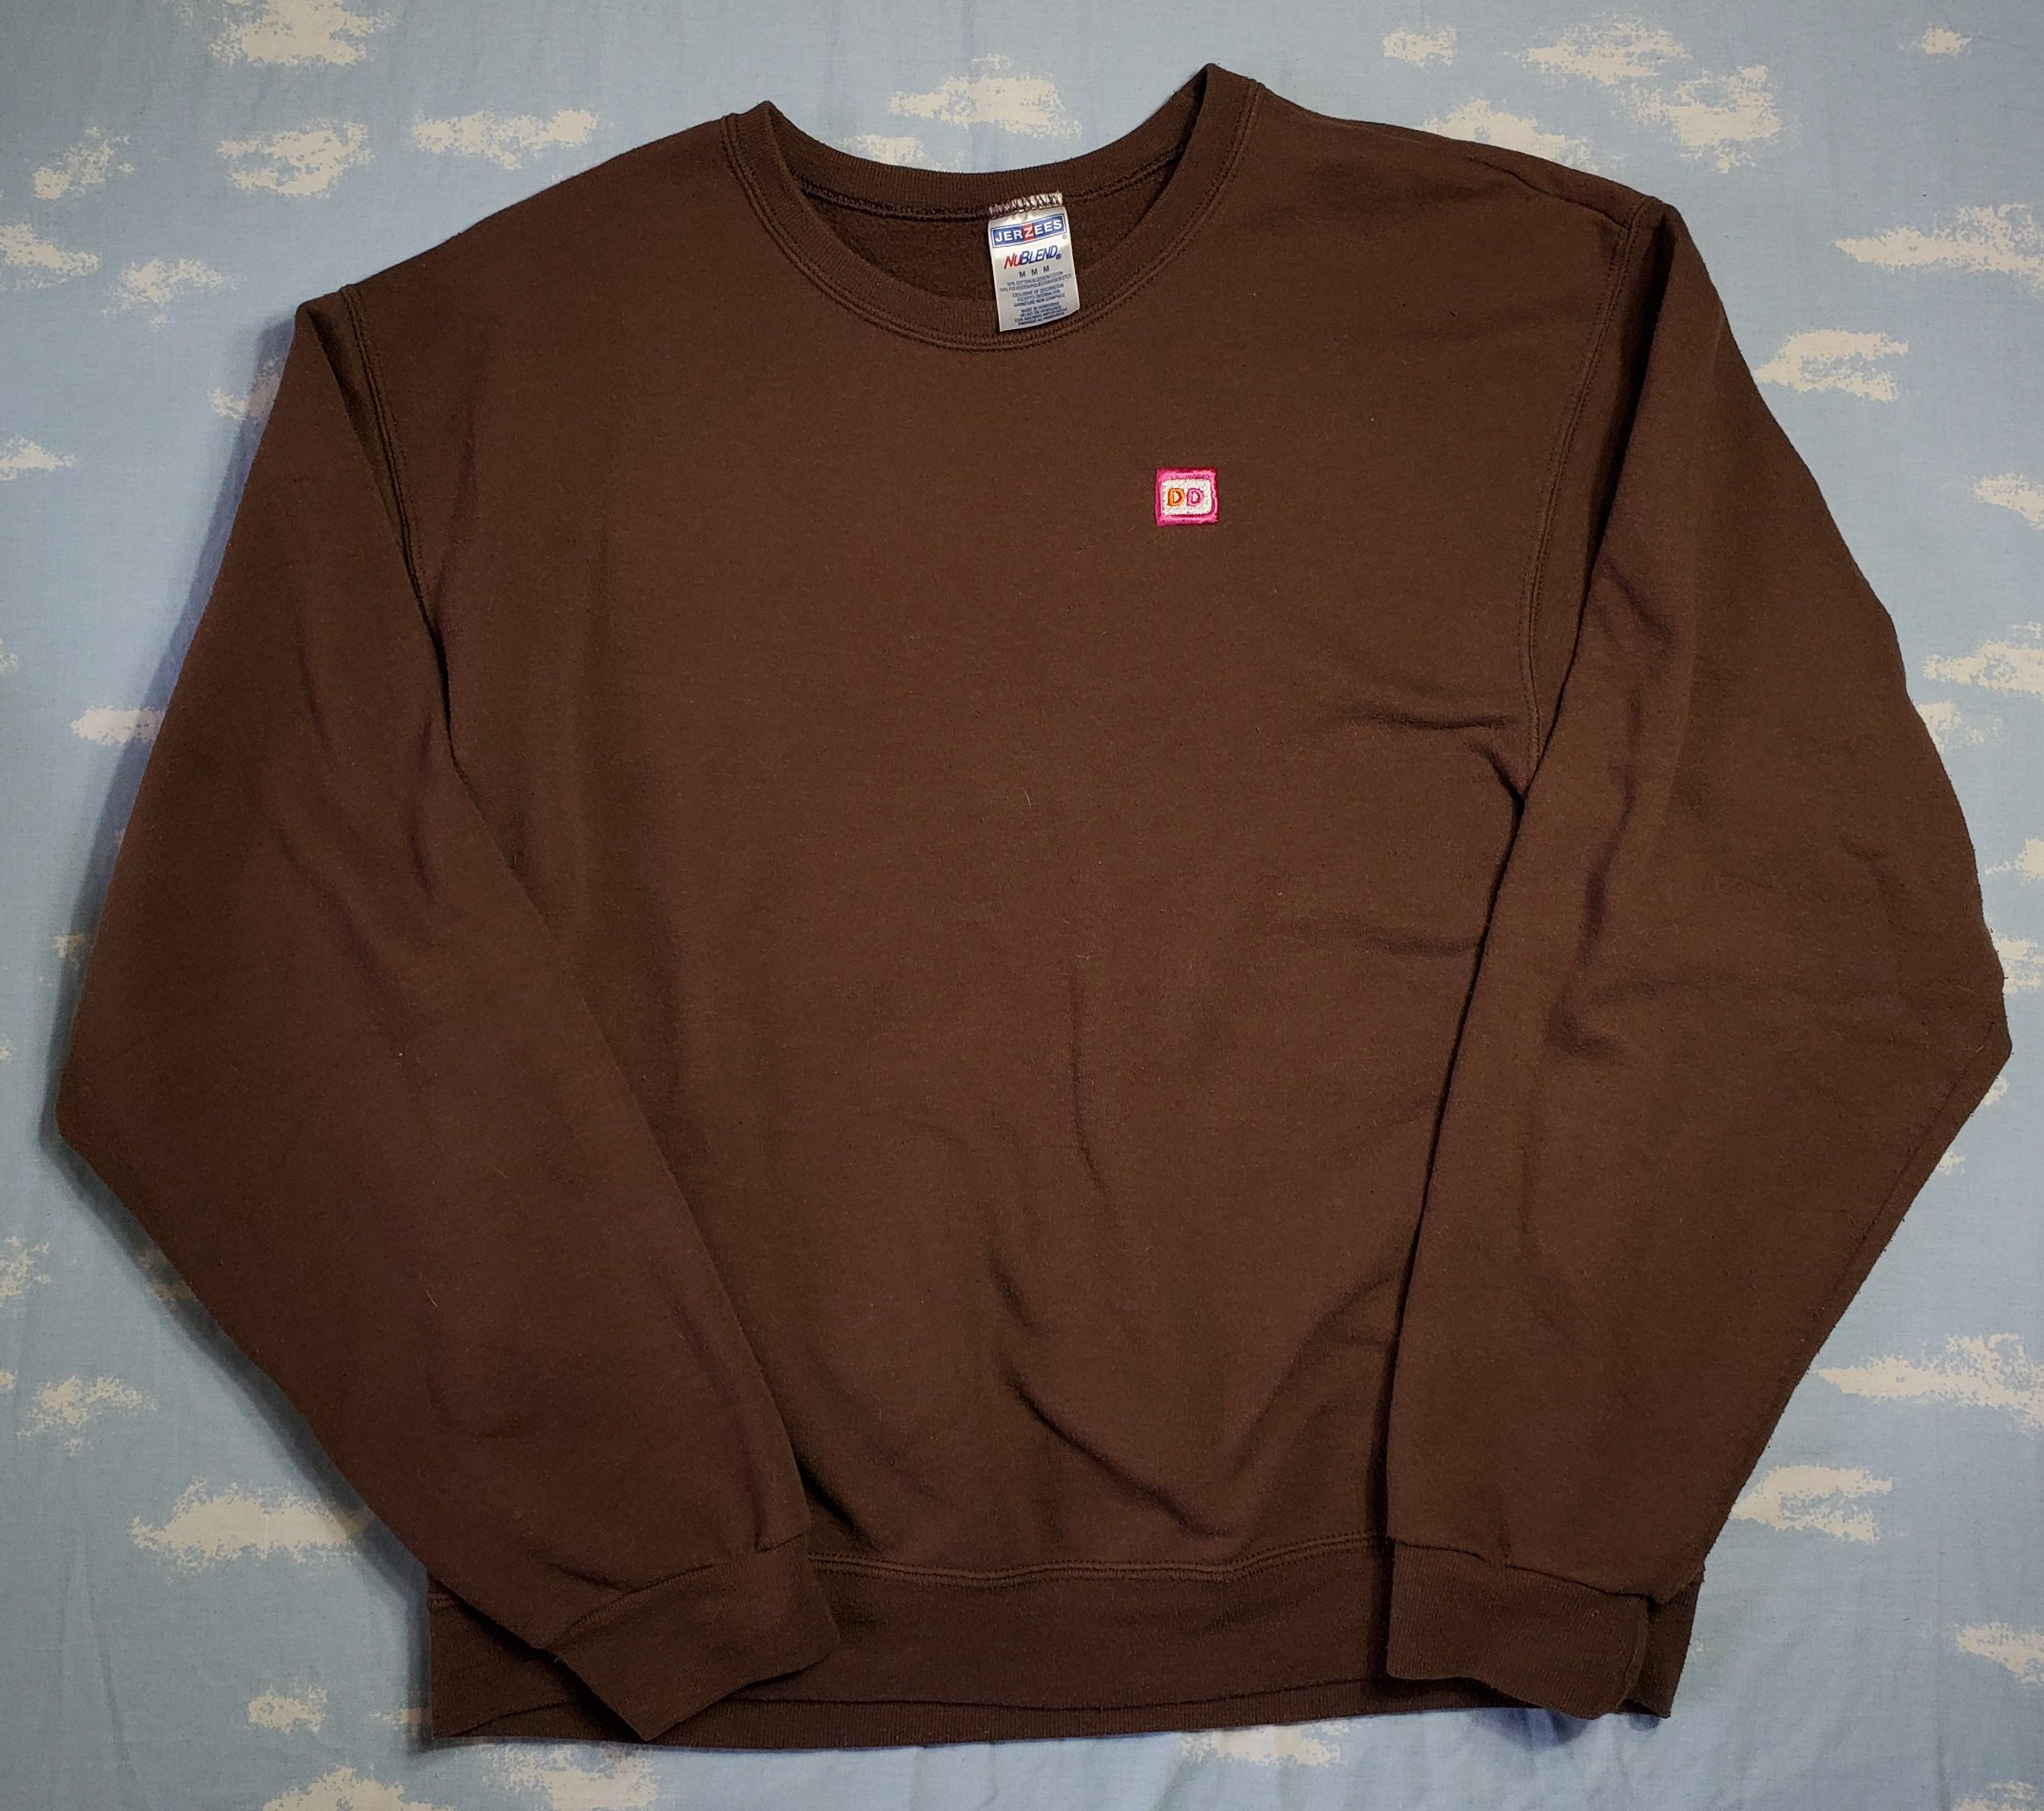 Xuforget Man Burger Cat School Short Sleeve T-Shirts Cotton Tops